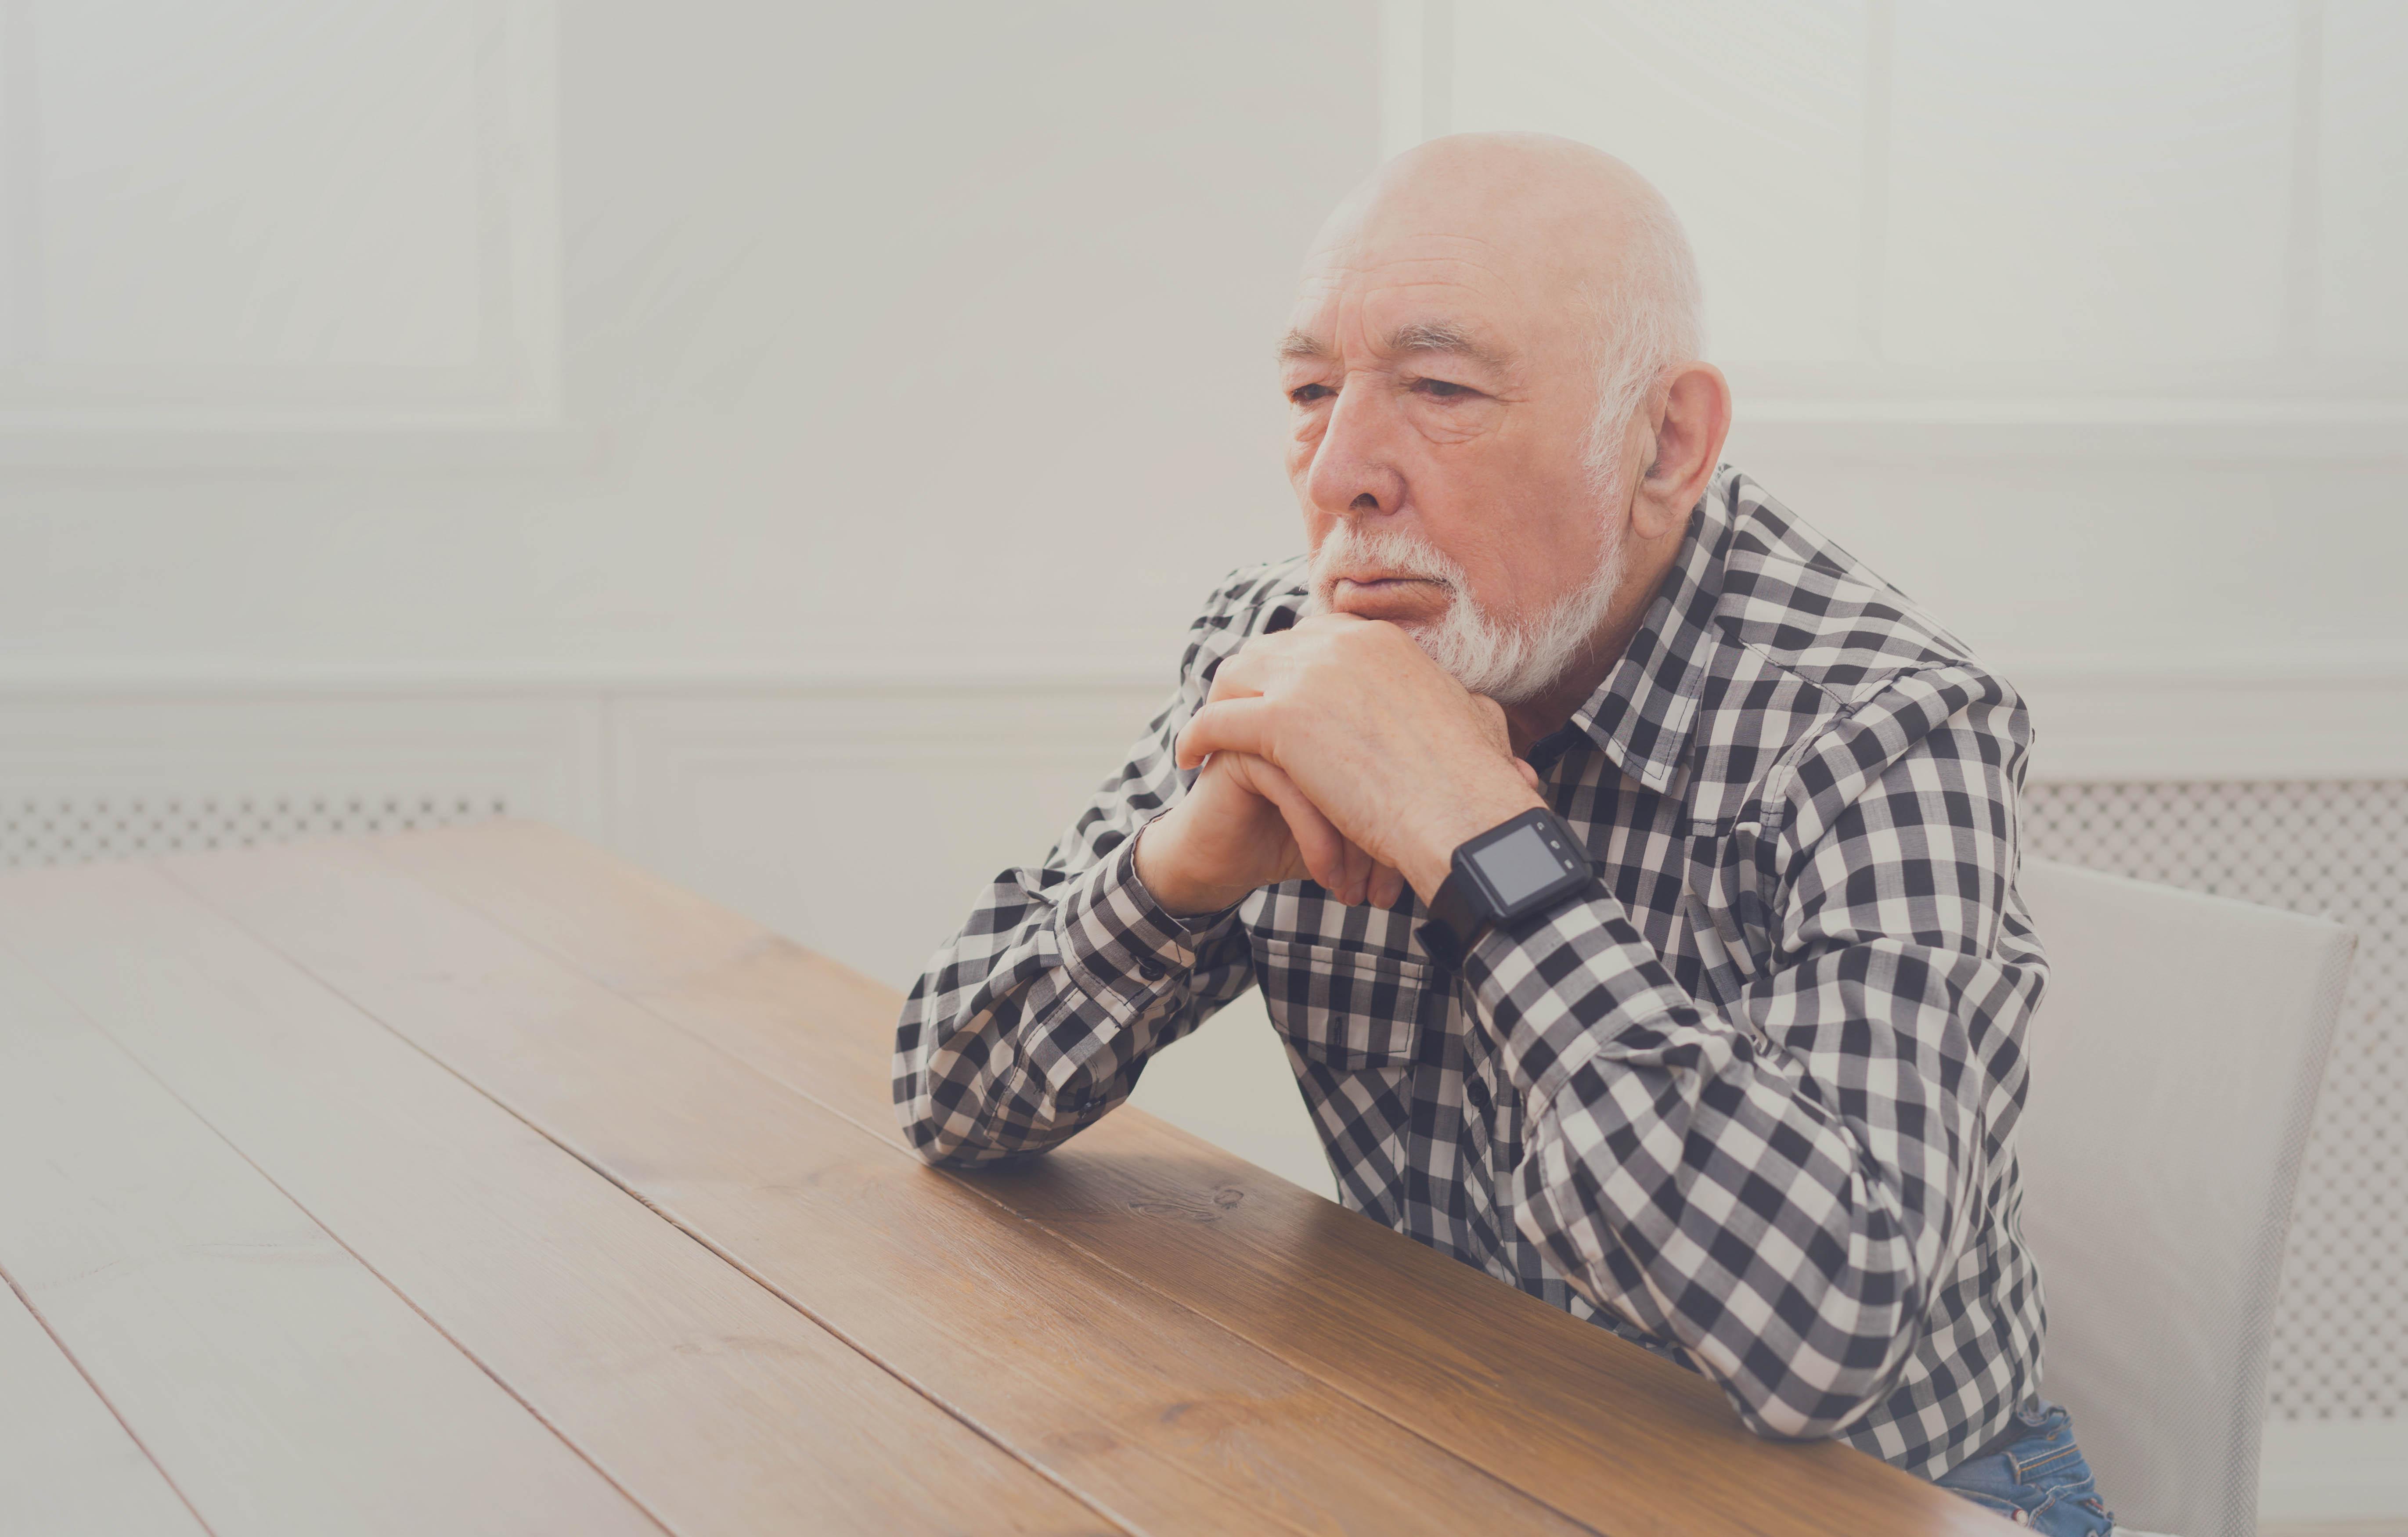 eye exam, Senior Man Thinking at Table in St Albert, AB